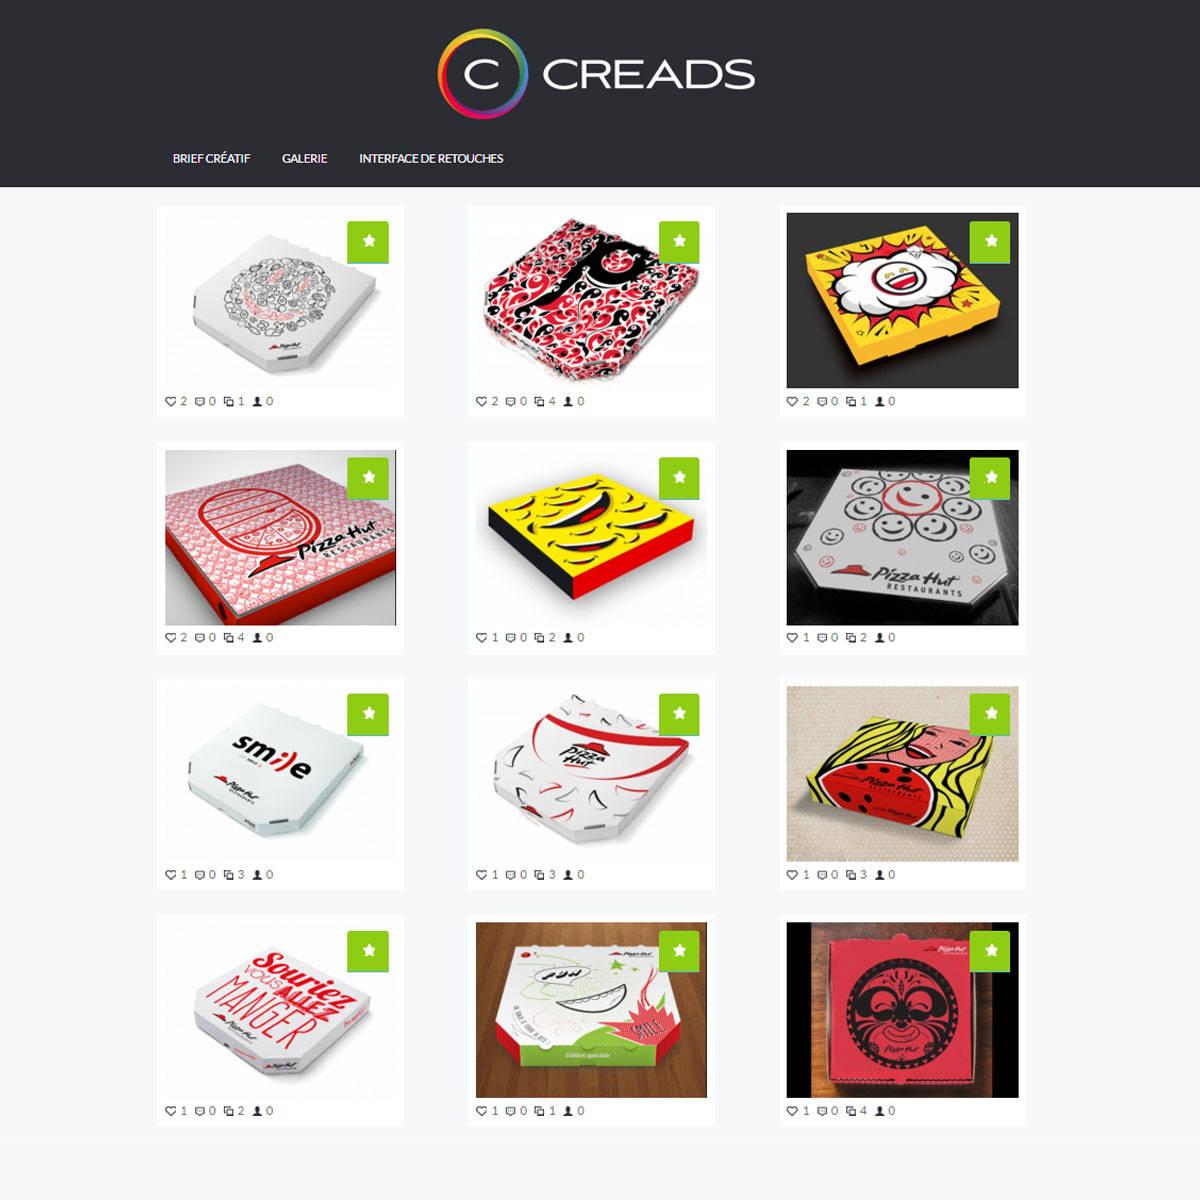 Creads_Galerie_PizzaHut